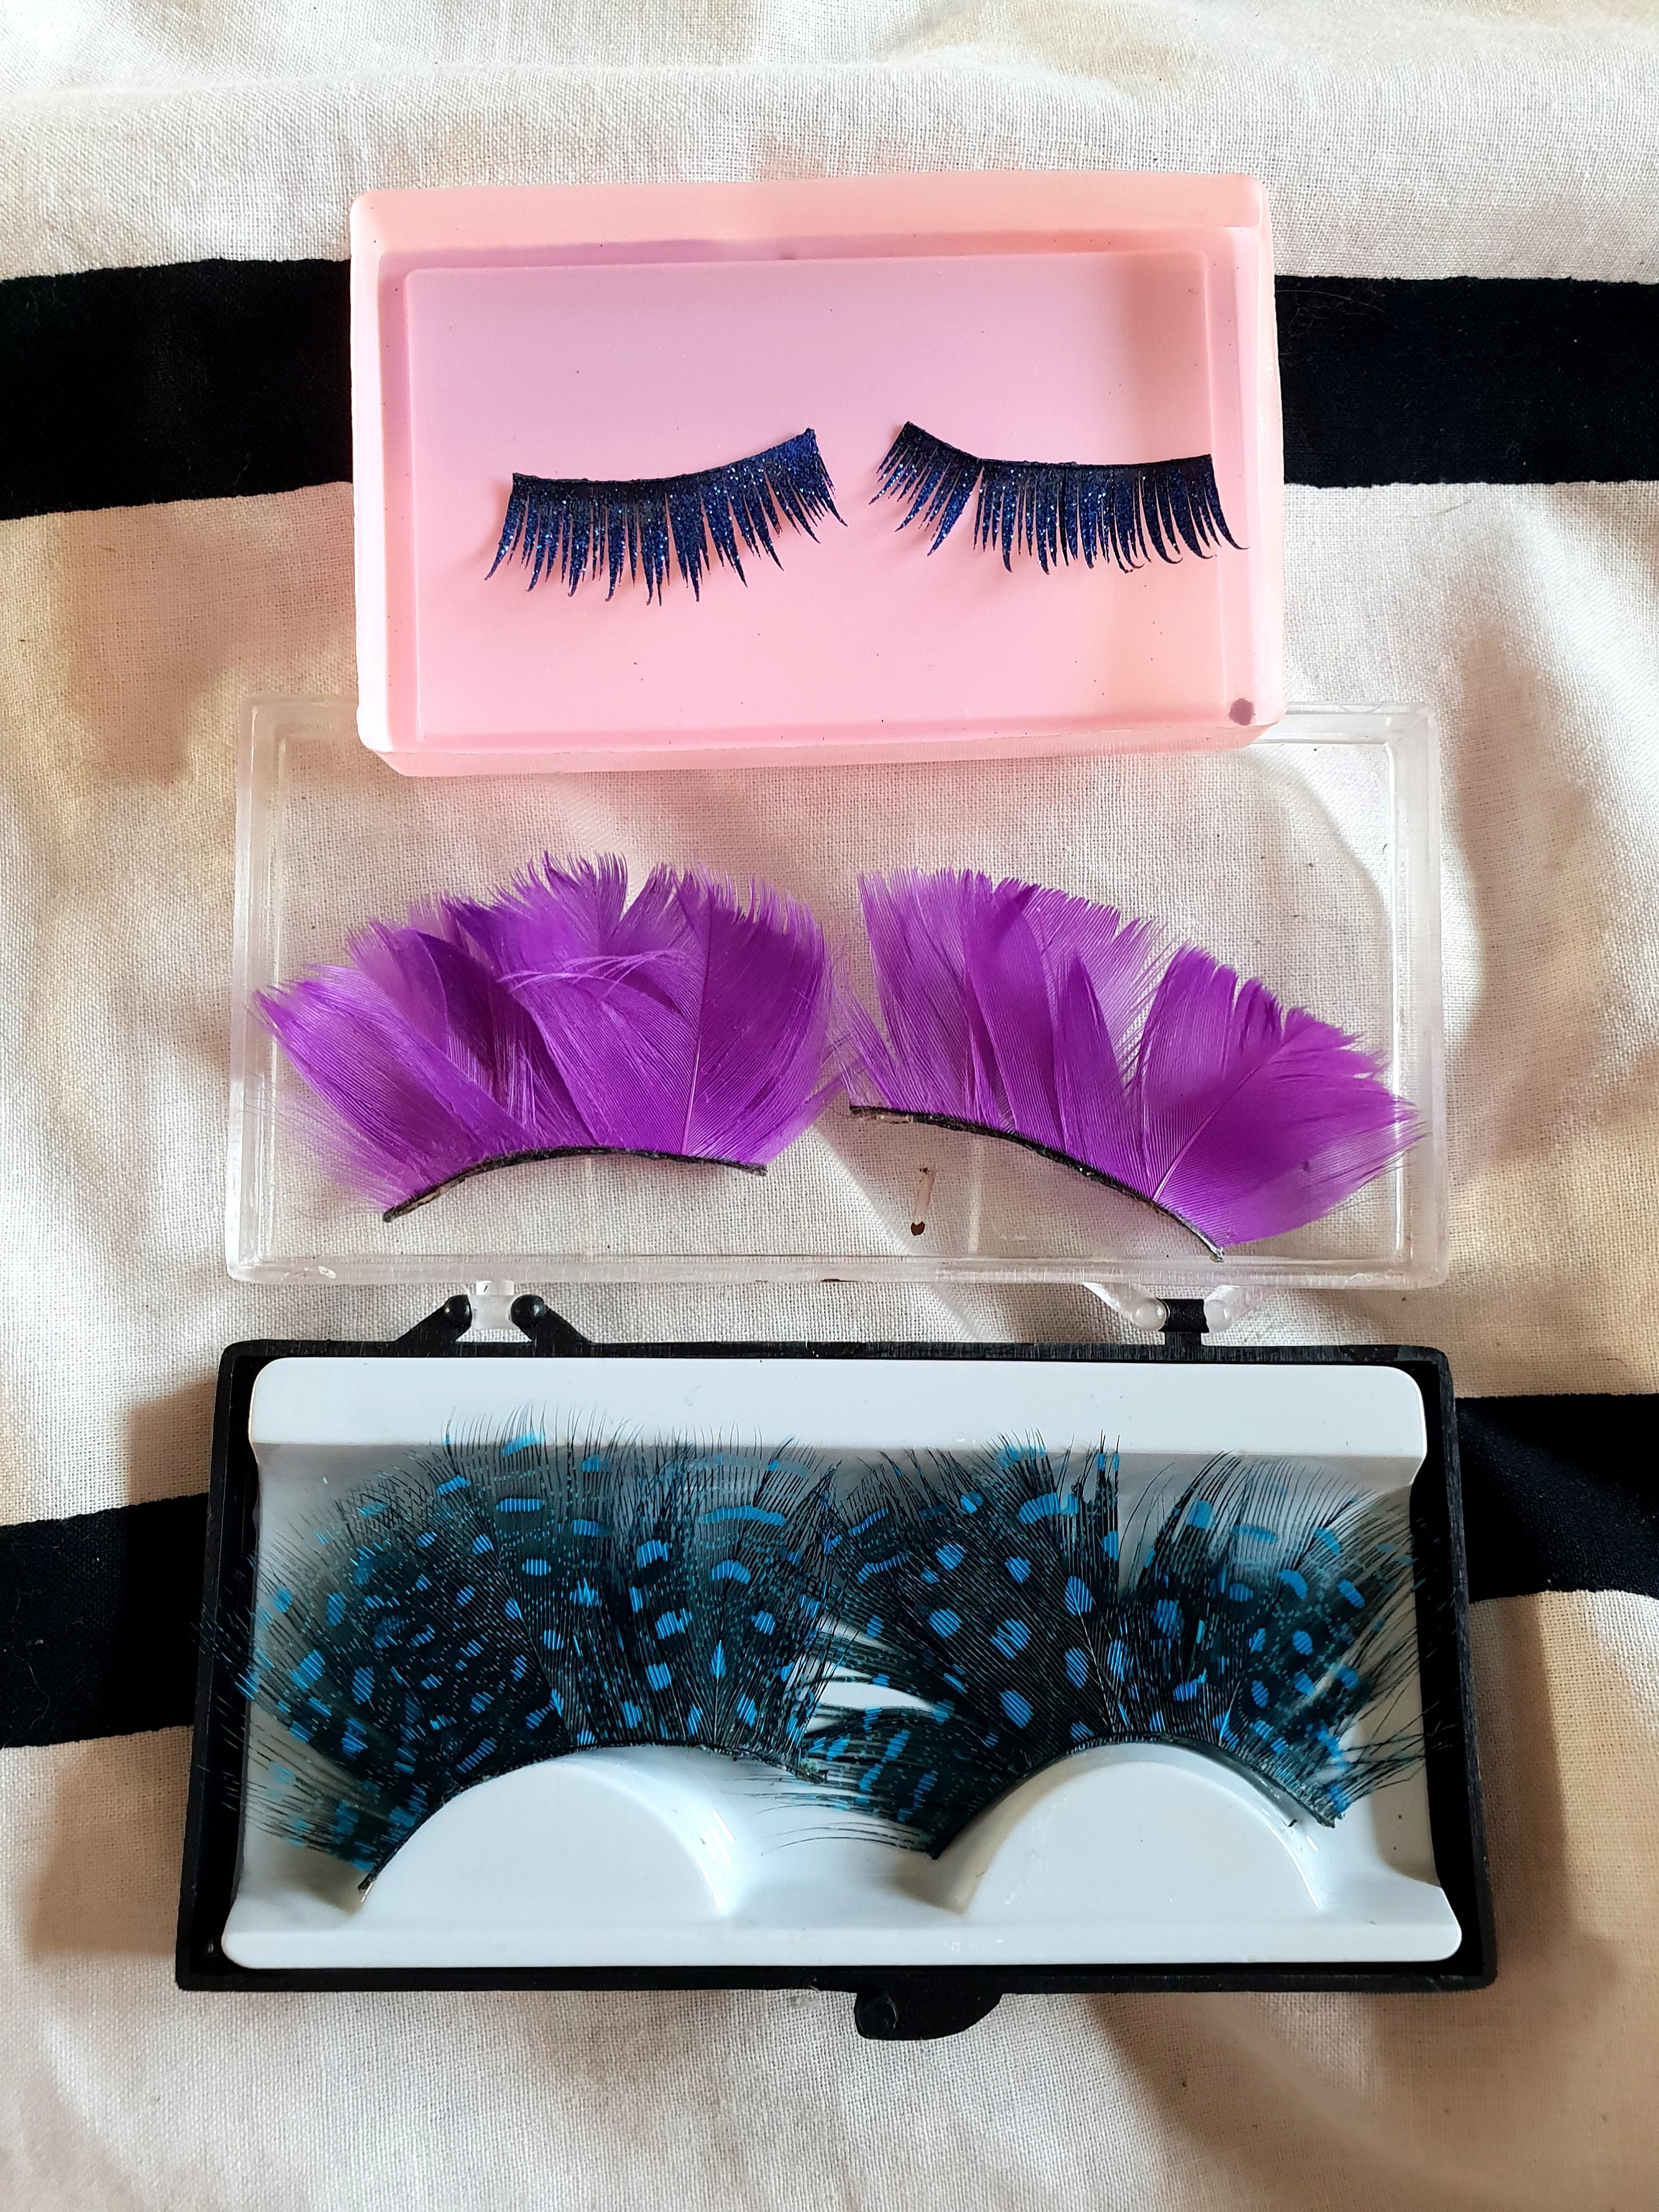 4682d57c8e0 Colour Feather false lashes, Health & Beauty, Makeup on Carousell